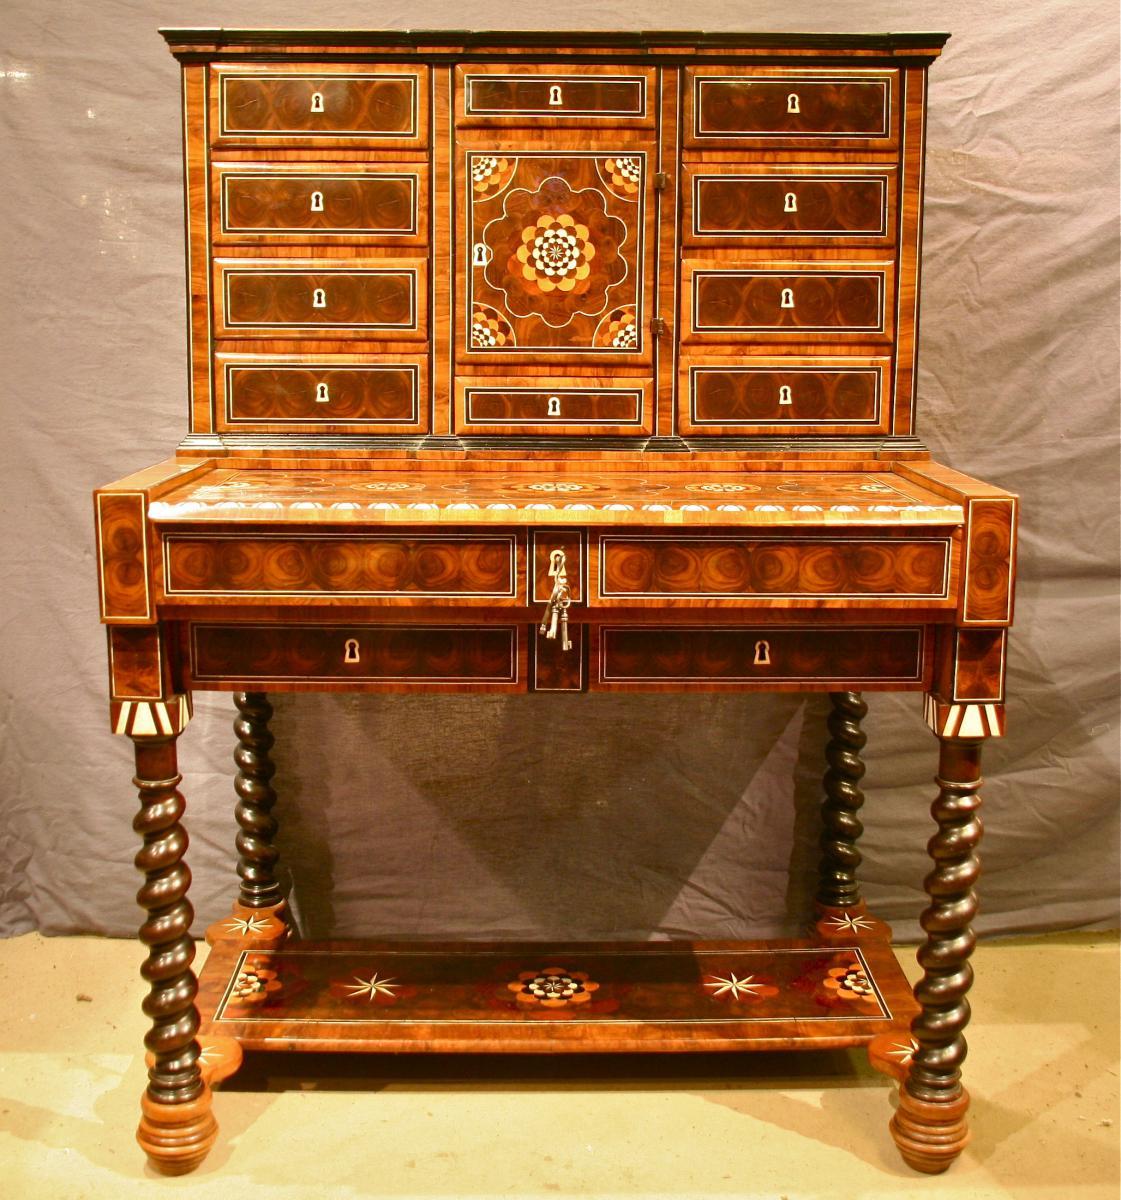 Cabinet bureau des flandres d but xviii me cabinets - Cabinet ophtalmo des flandres ...